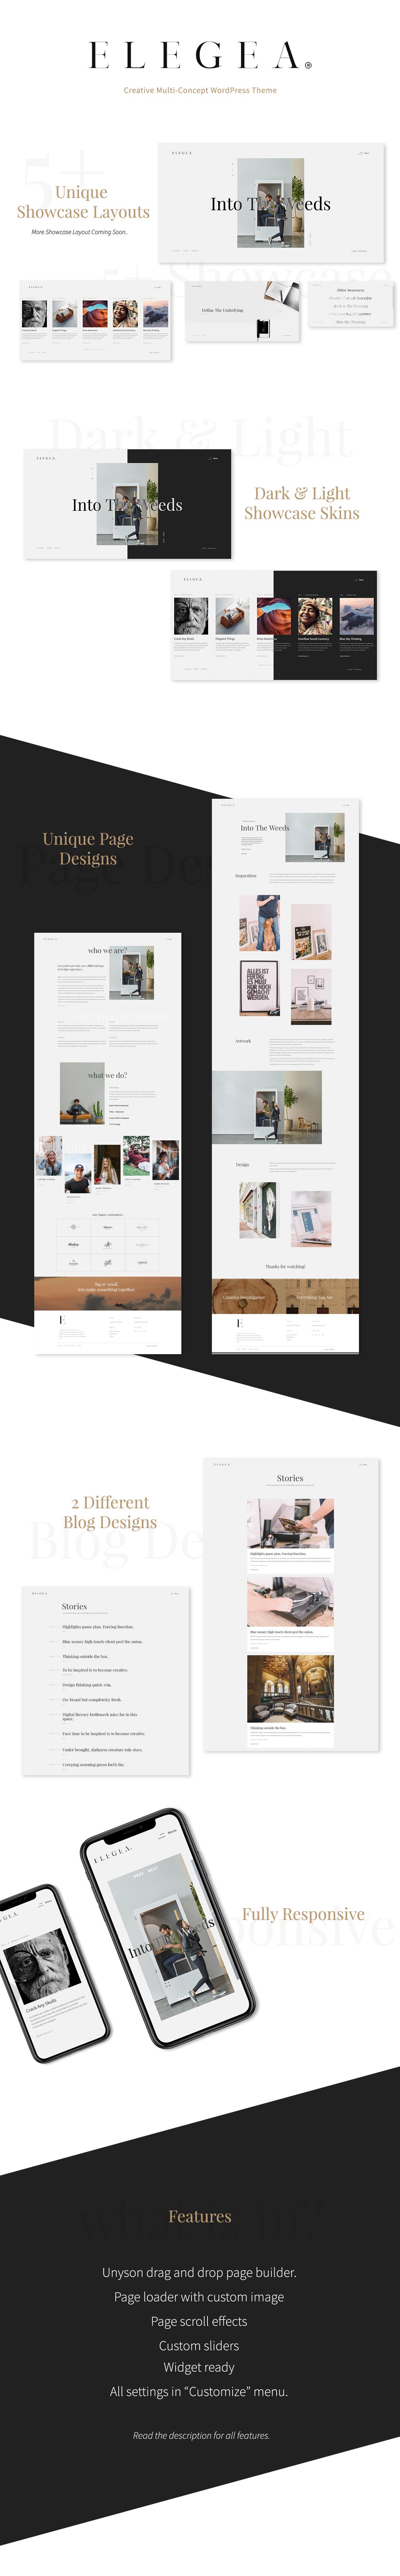 Elegea - Multi-Concept WordPress Theme - 1